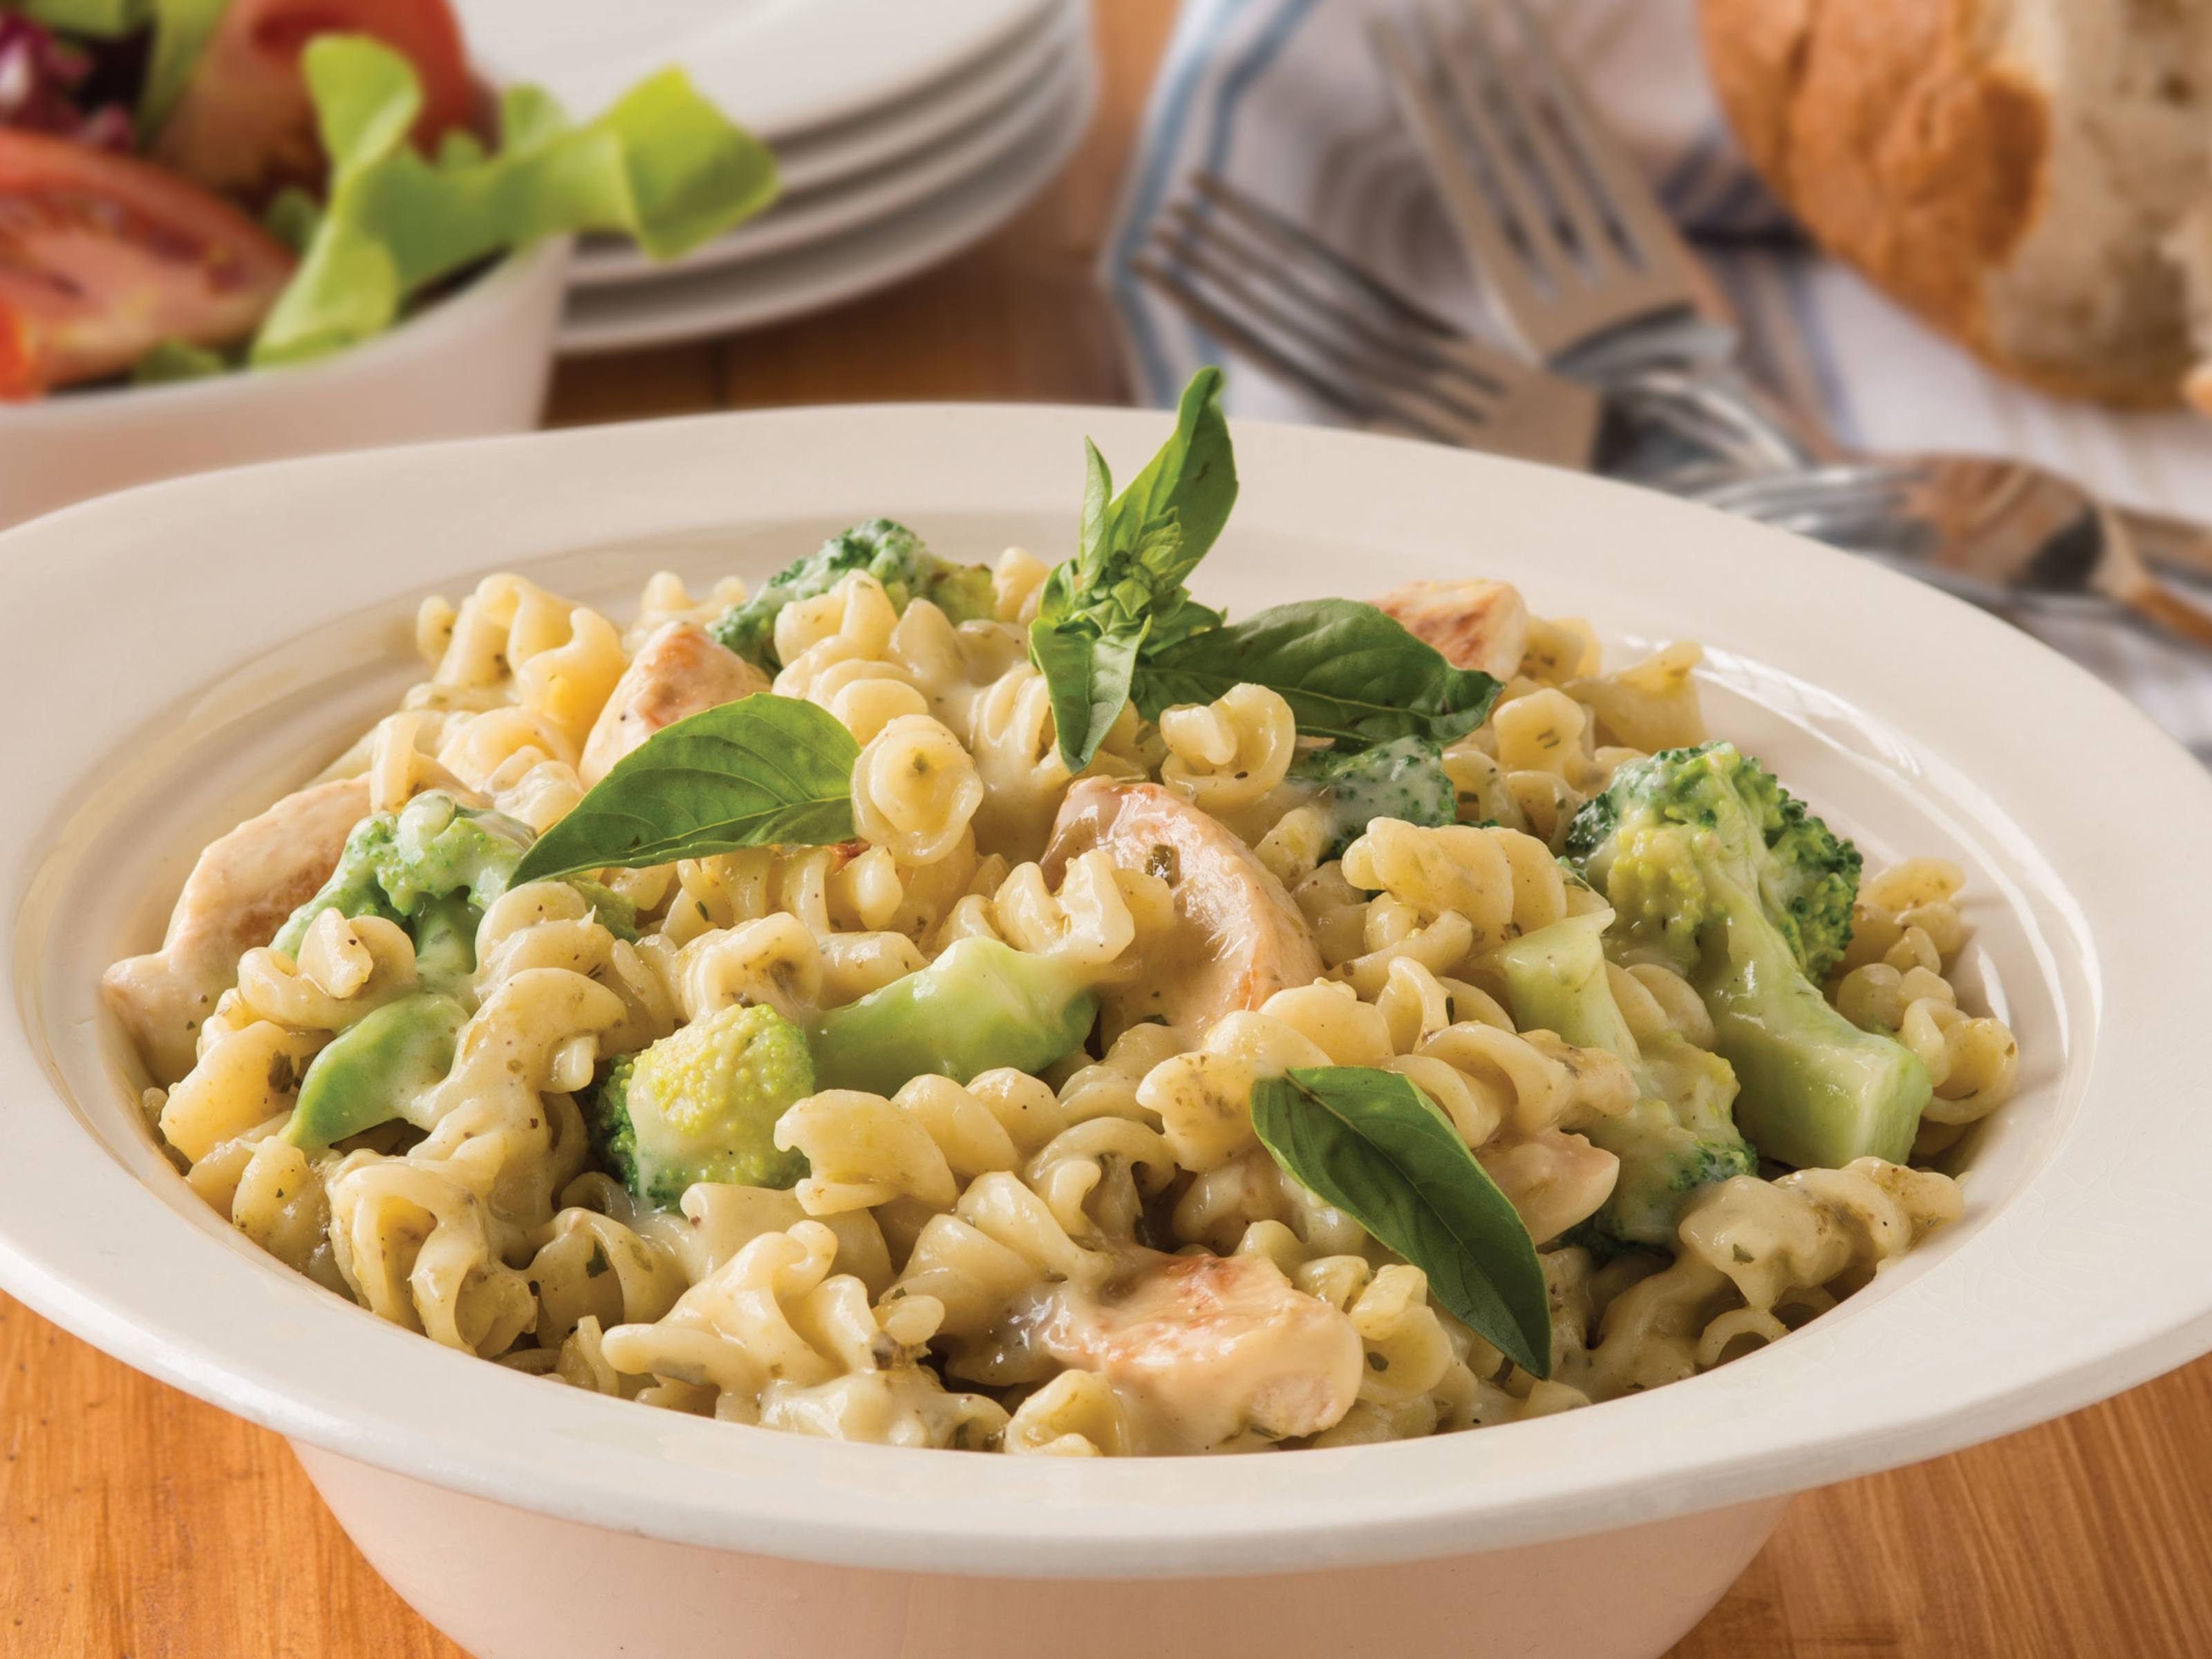 Chicken recipes mid week meal continental chicken pesto pasta recipe with broccoli forumfinder Gallery